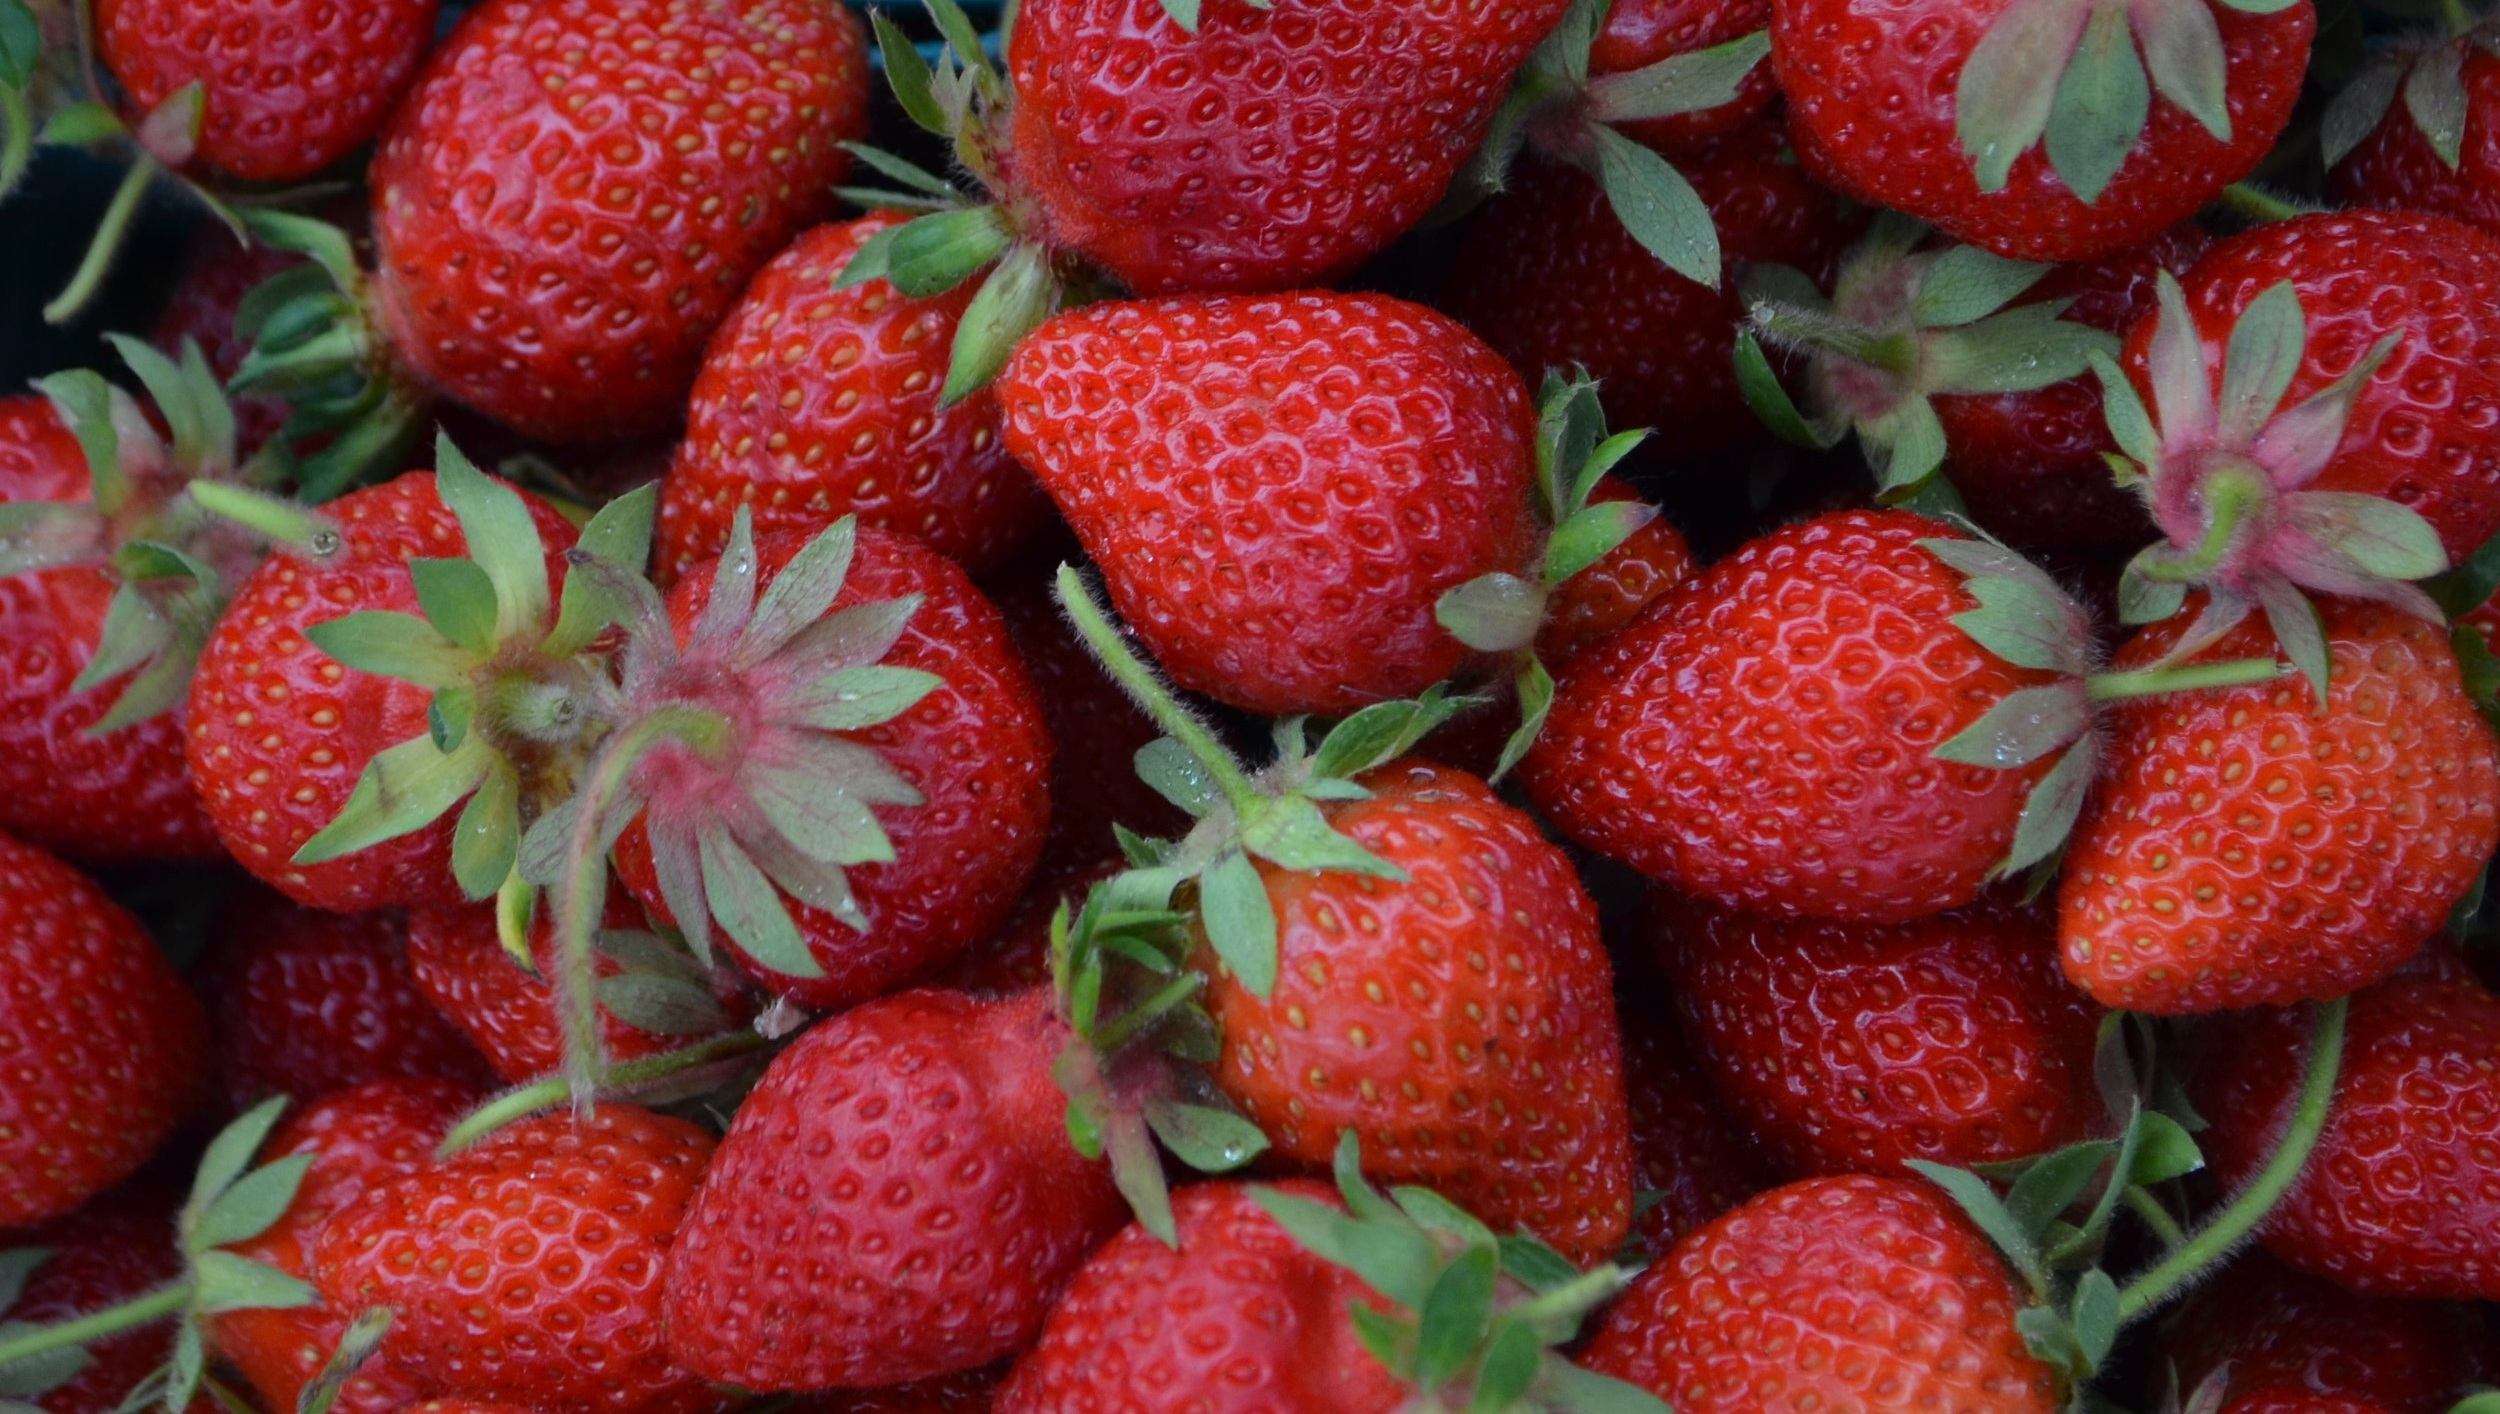 Pablo%2BMunoz_Strawberries%2B%25281%2529.jpg